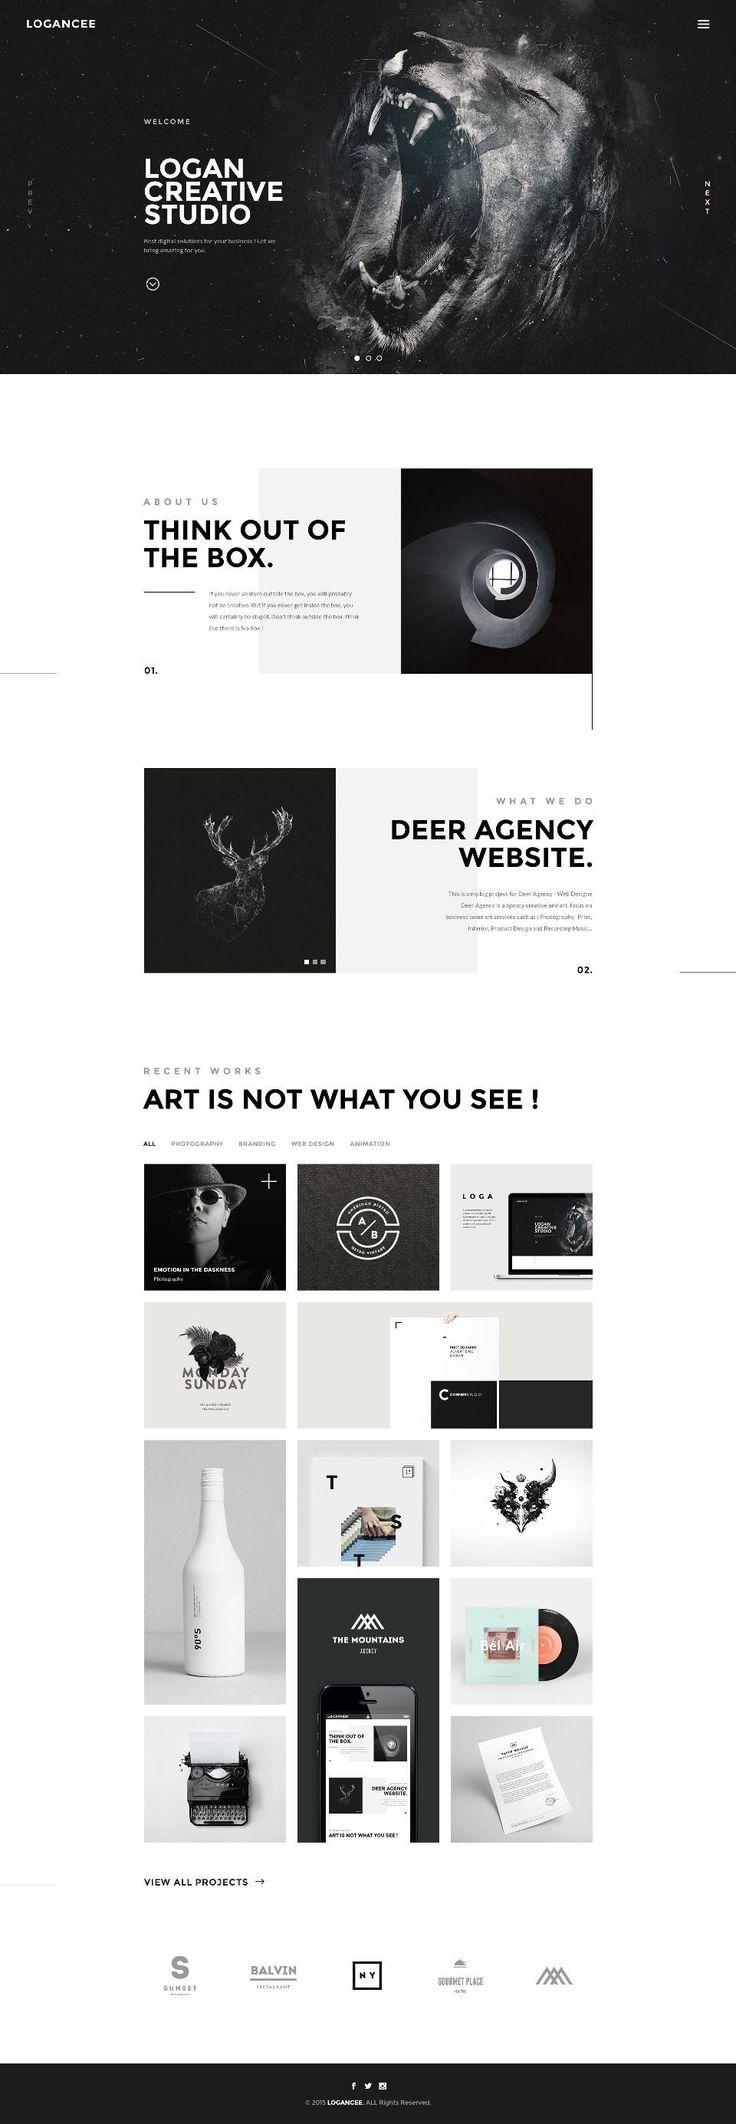 Logancee Web Design Inspiration Part 3